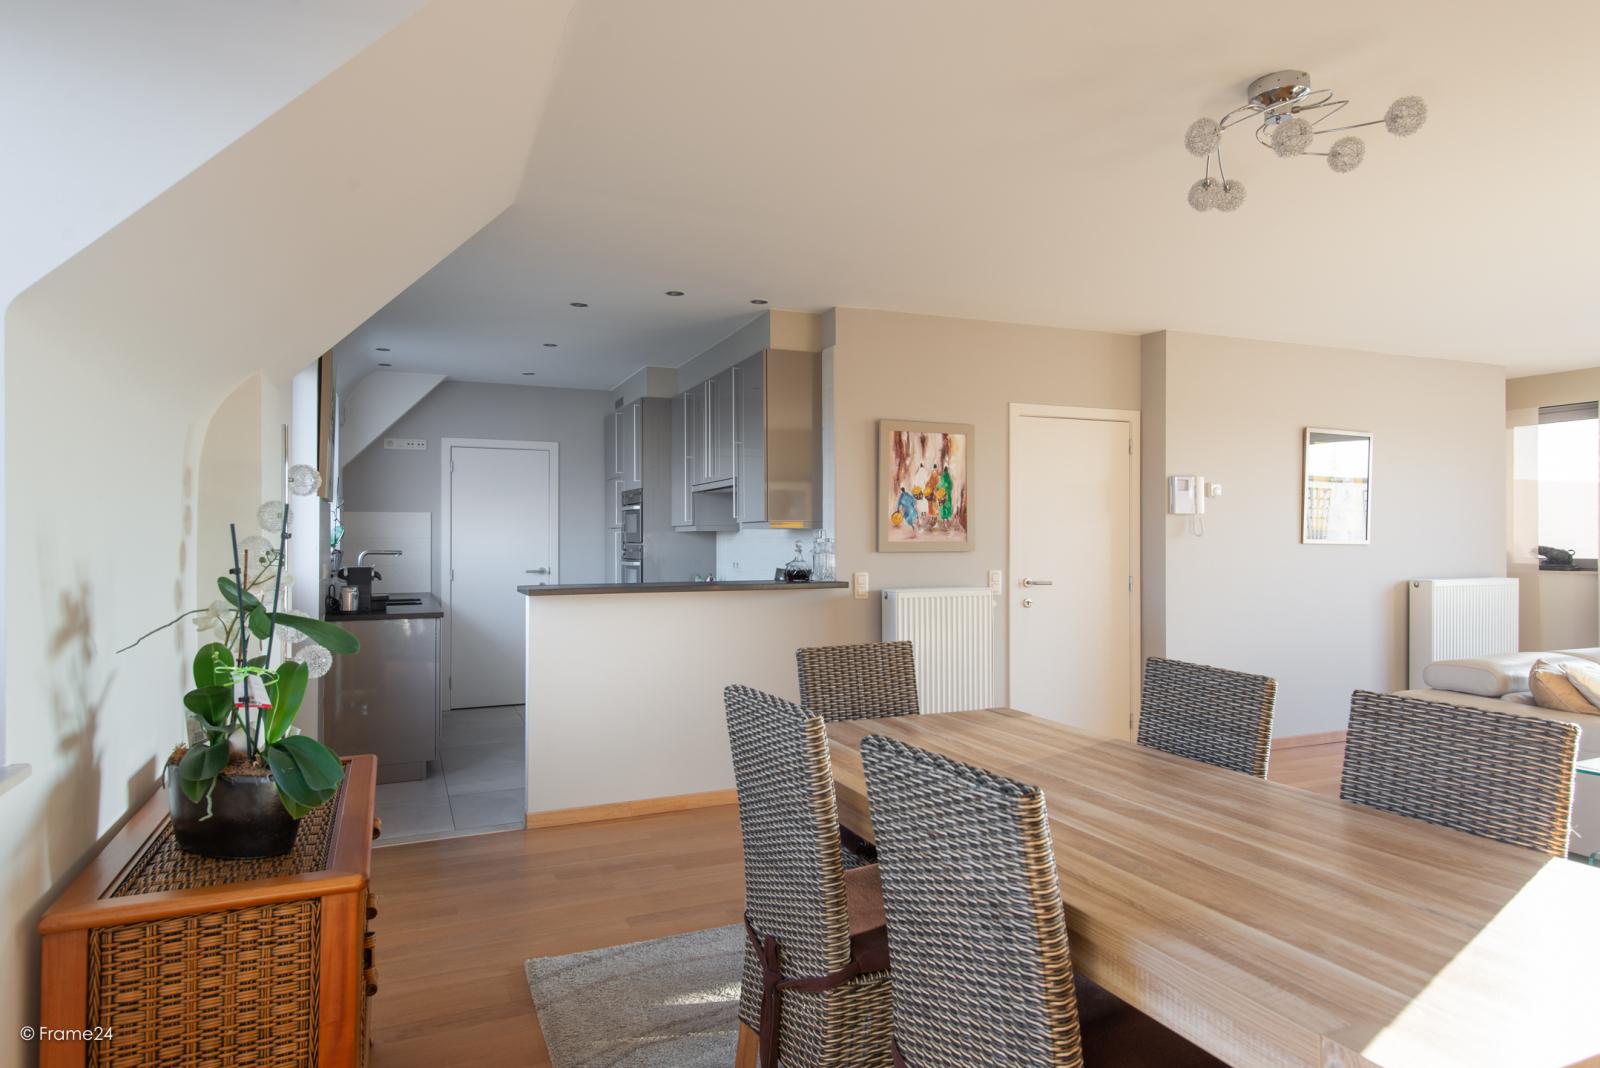 Riant dakappartement (130 m²) met zonnig terras in residentie 'Eyserhof' te Wijnegem! afbeelding 6